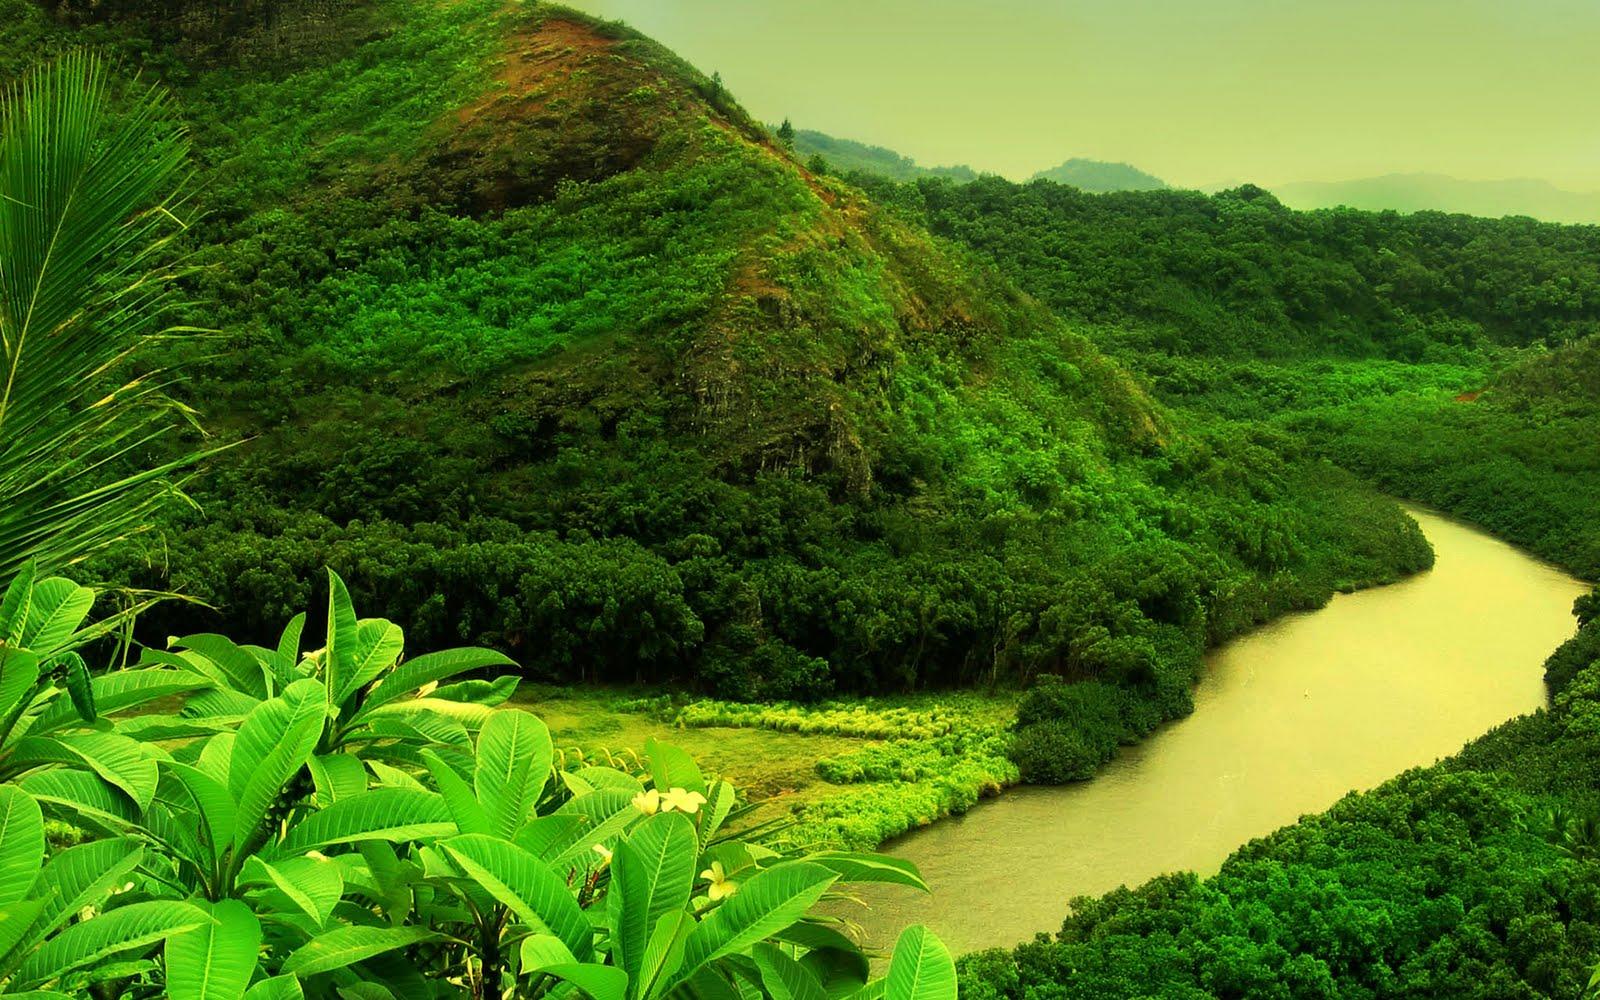 Jungle Forest HD Wallpapers Photos | Desktop Wallpapers